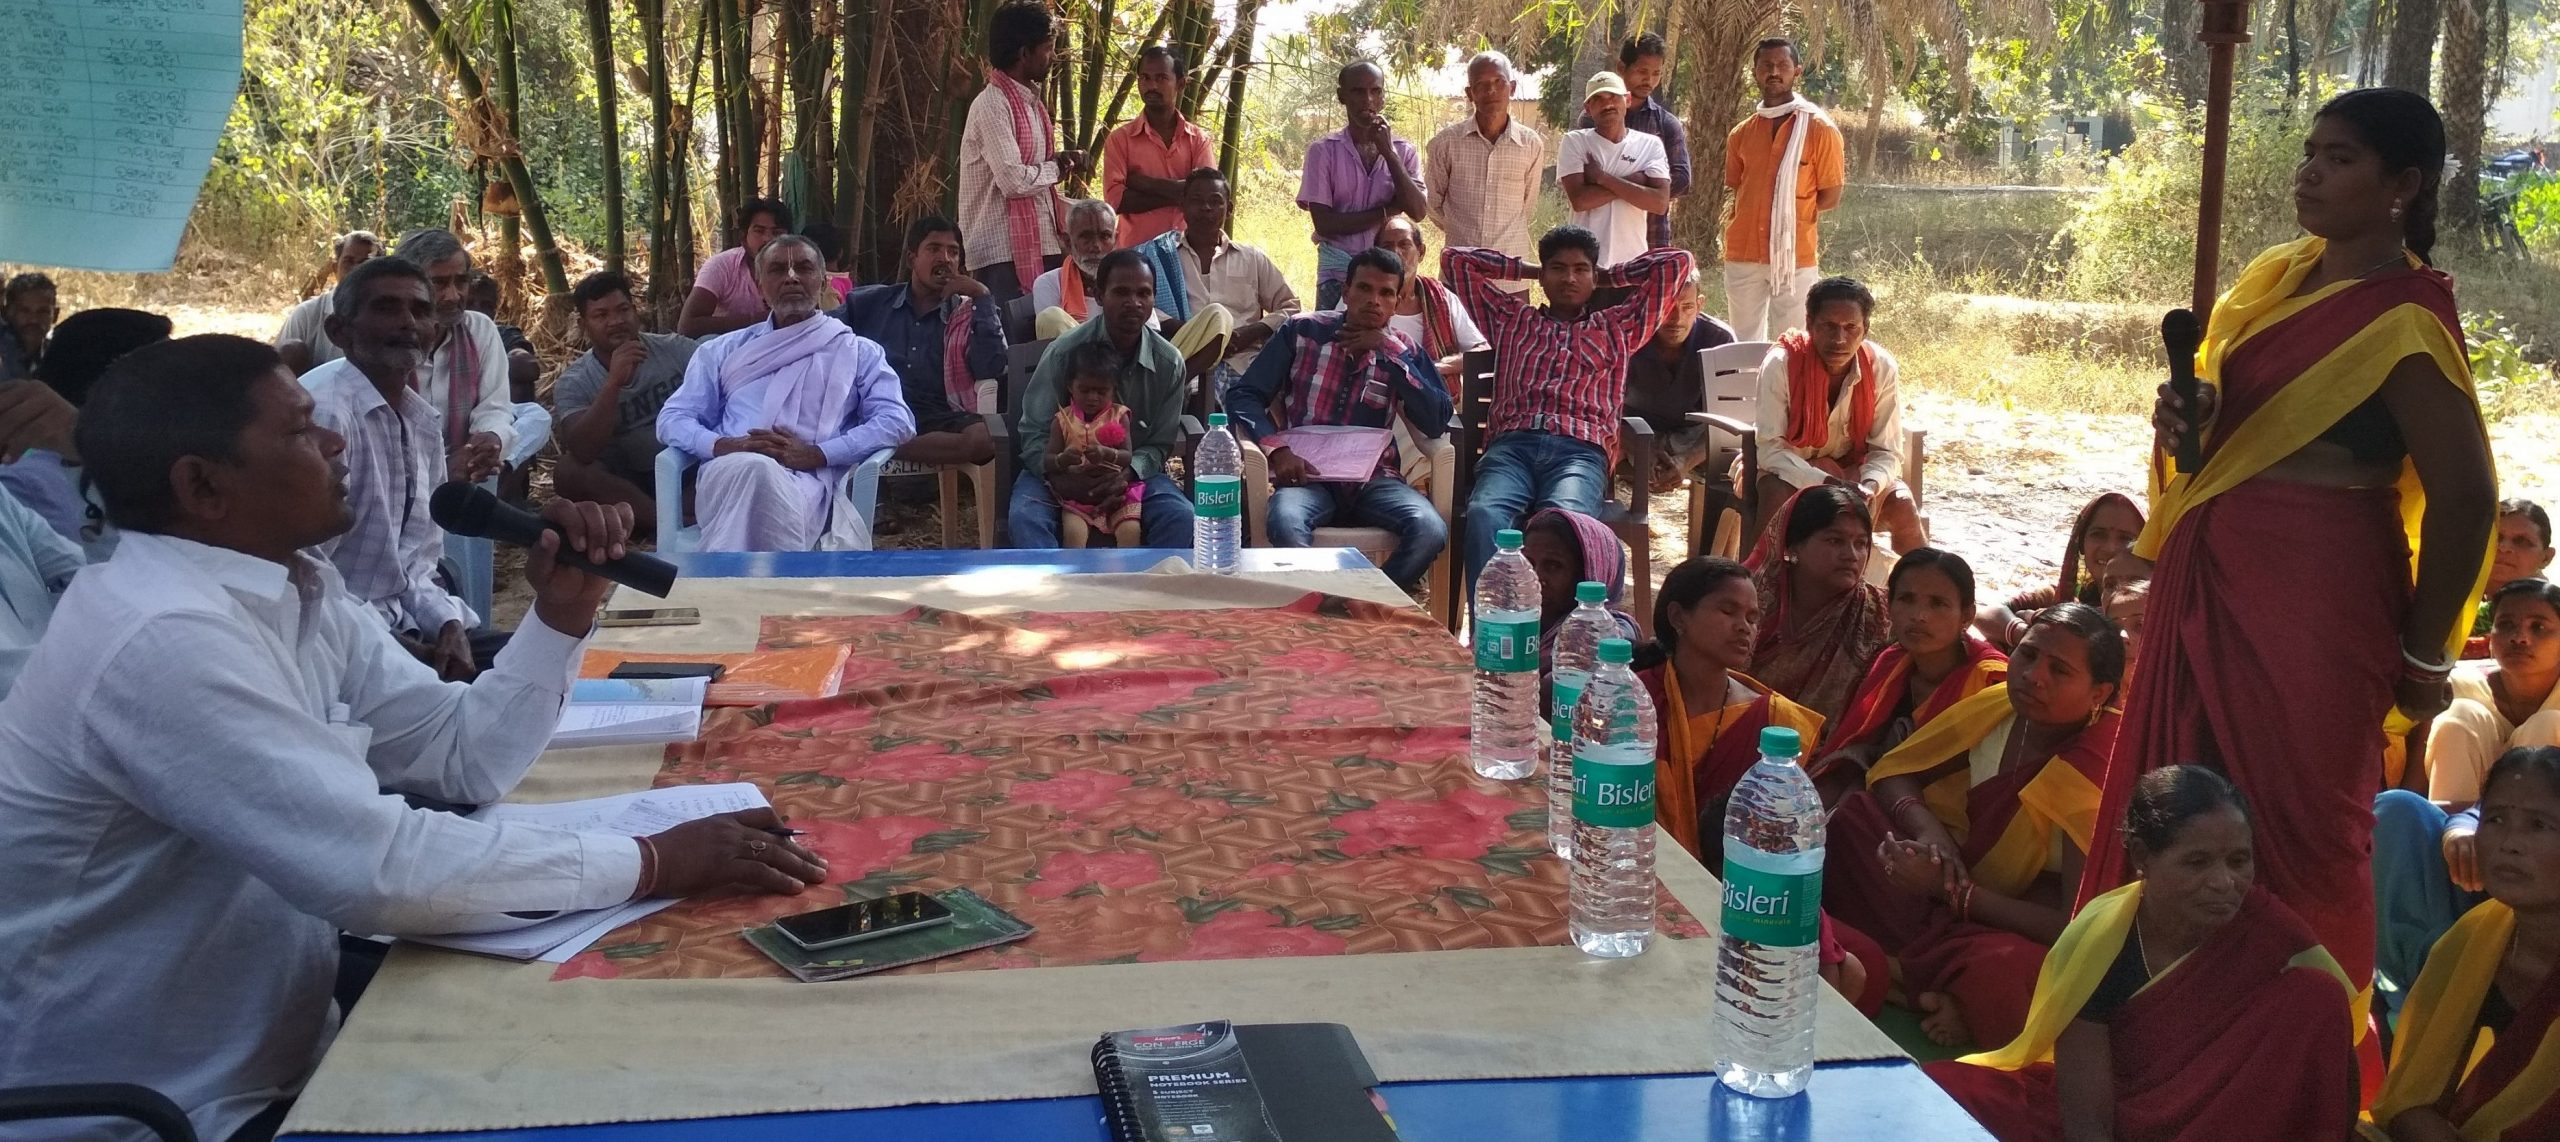 Village panchayat having a discussion